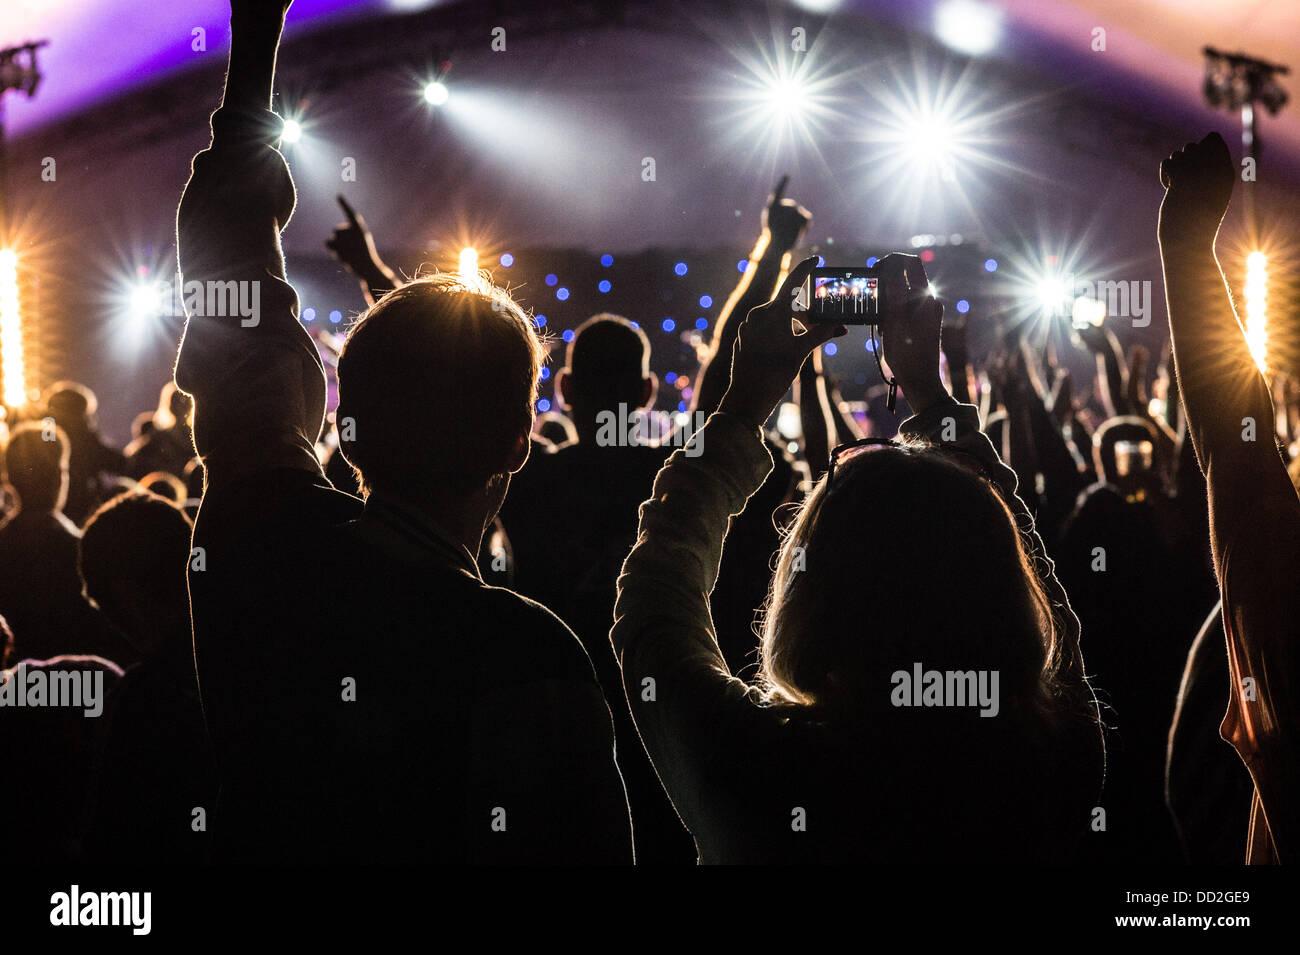 Aberystwyth Wales UK, Freitag, 23. August 2013 die Premiere des großen Tribute Festival 2013, Wales nur Musikfestival Stockbild